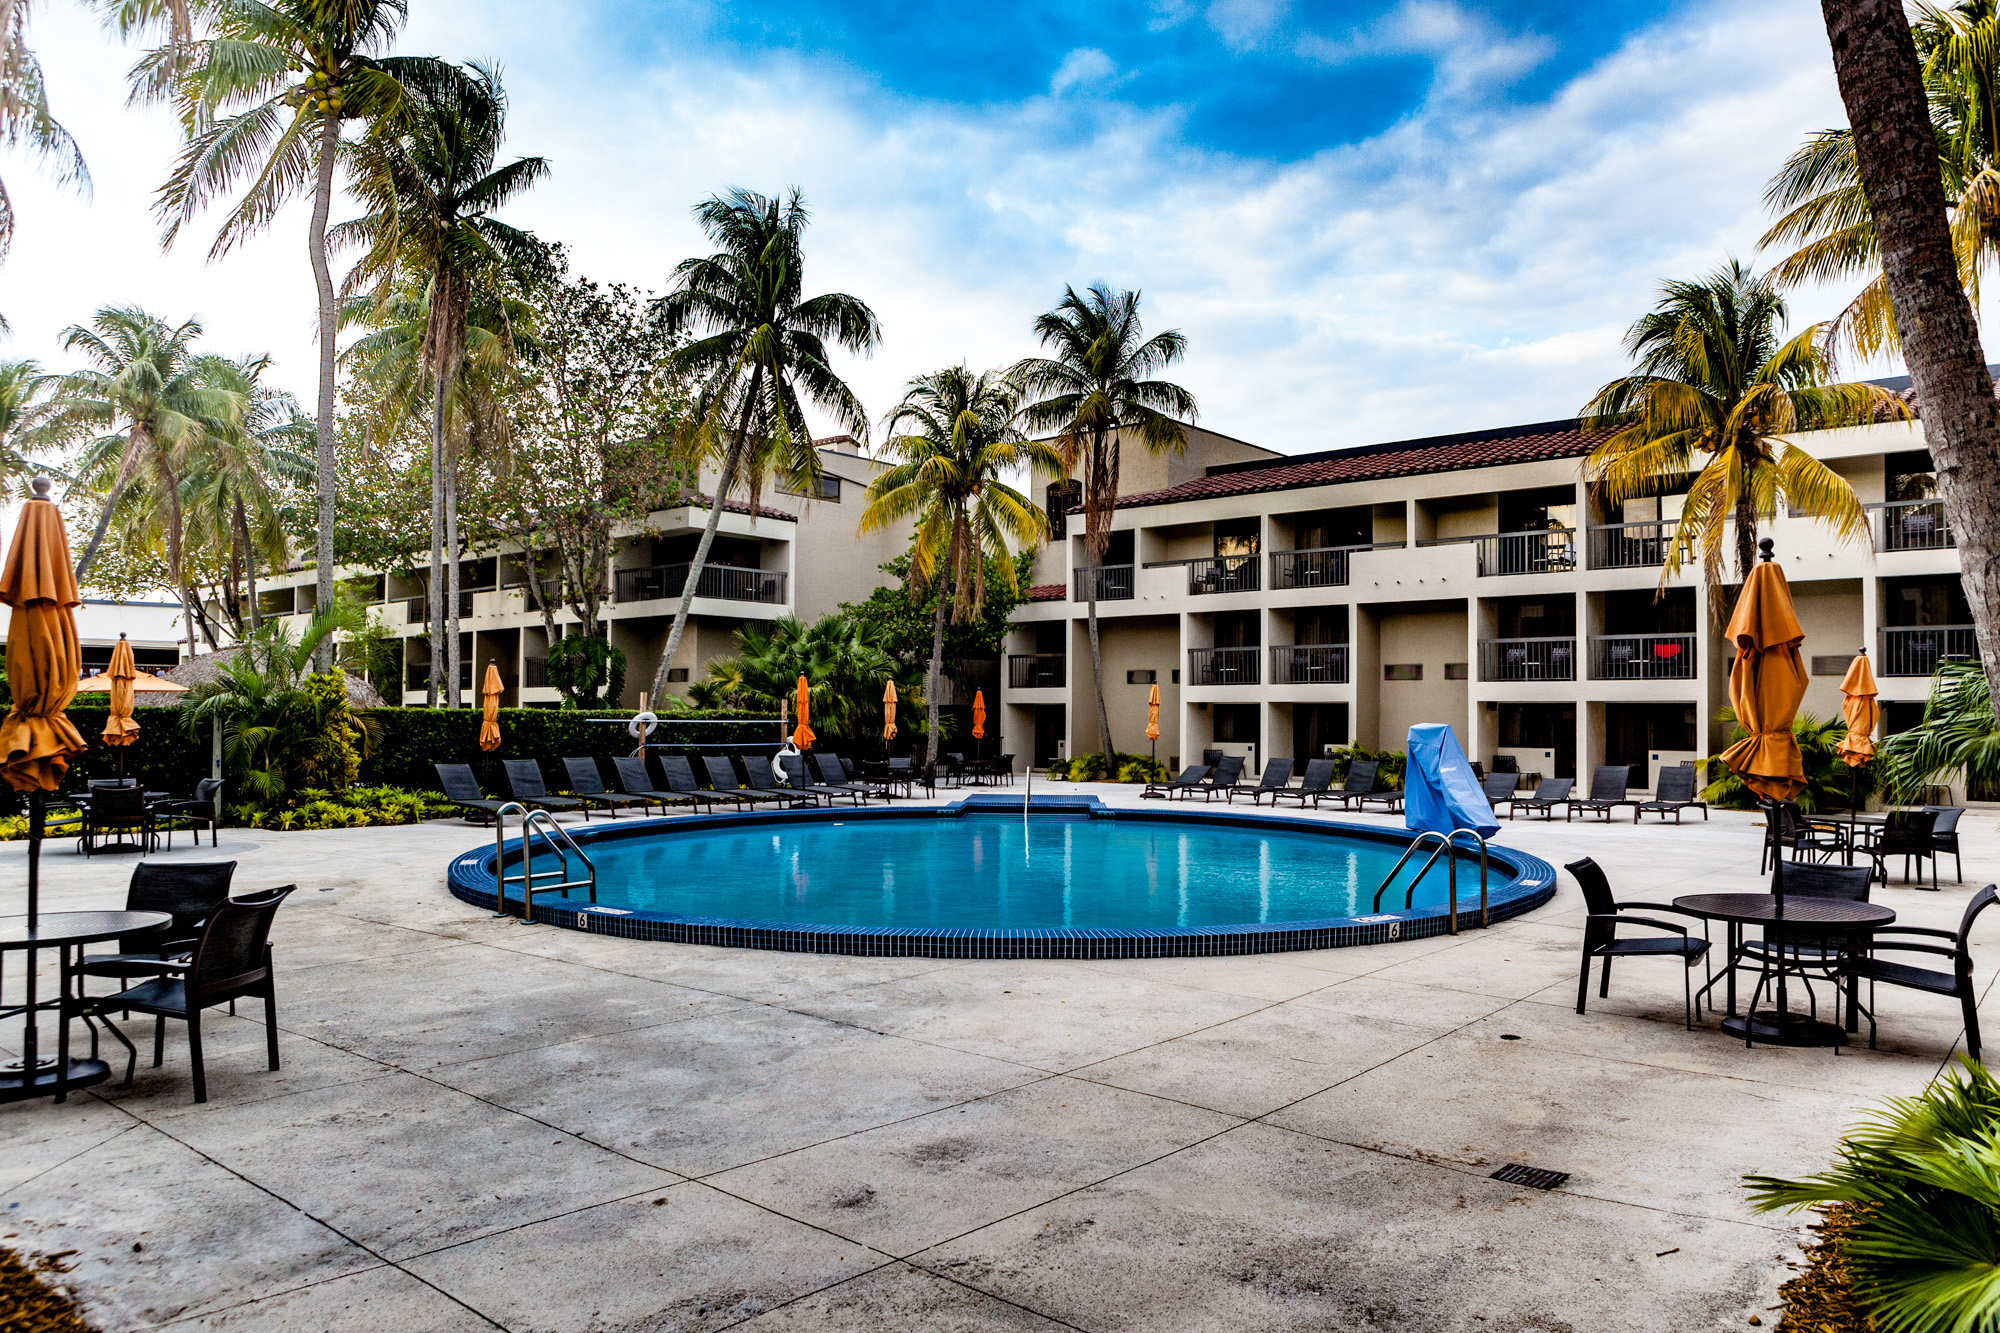 Hotel Review: Shula's Hotel & Golf Club